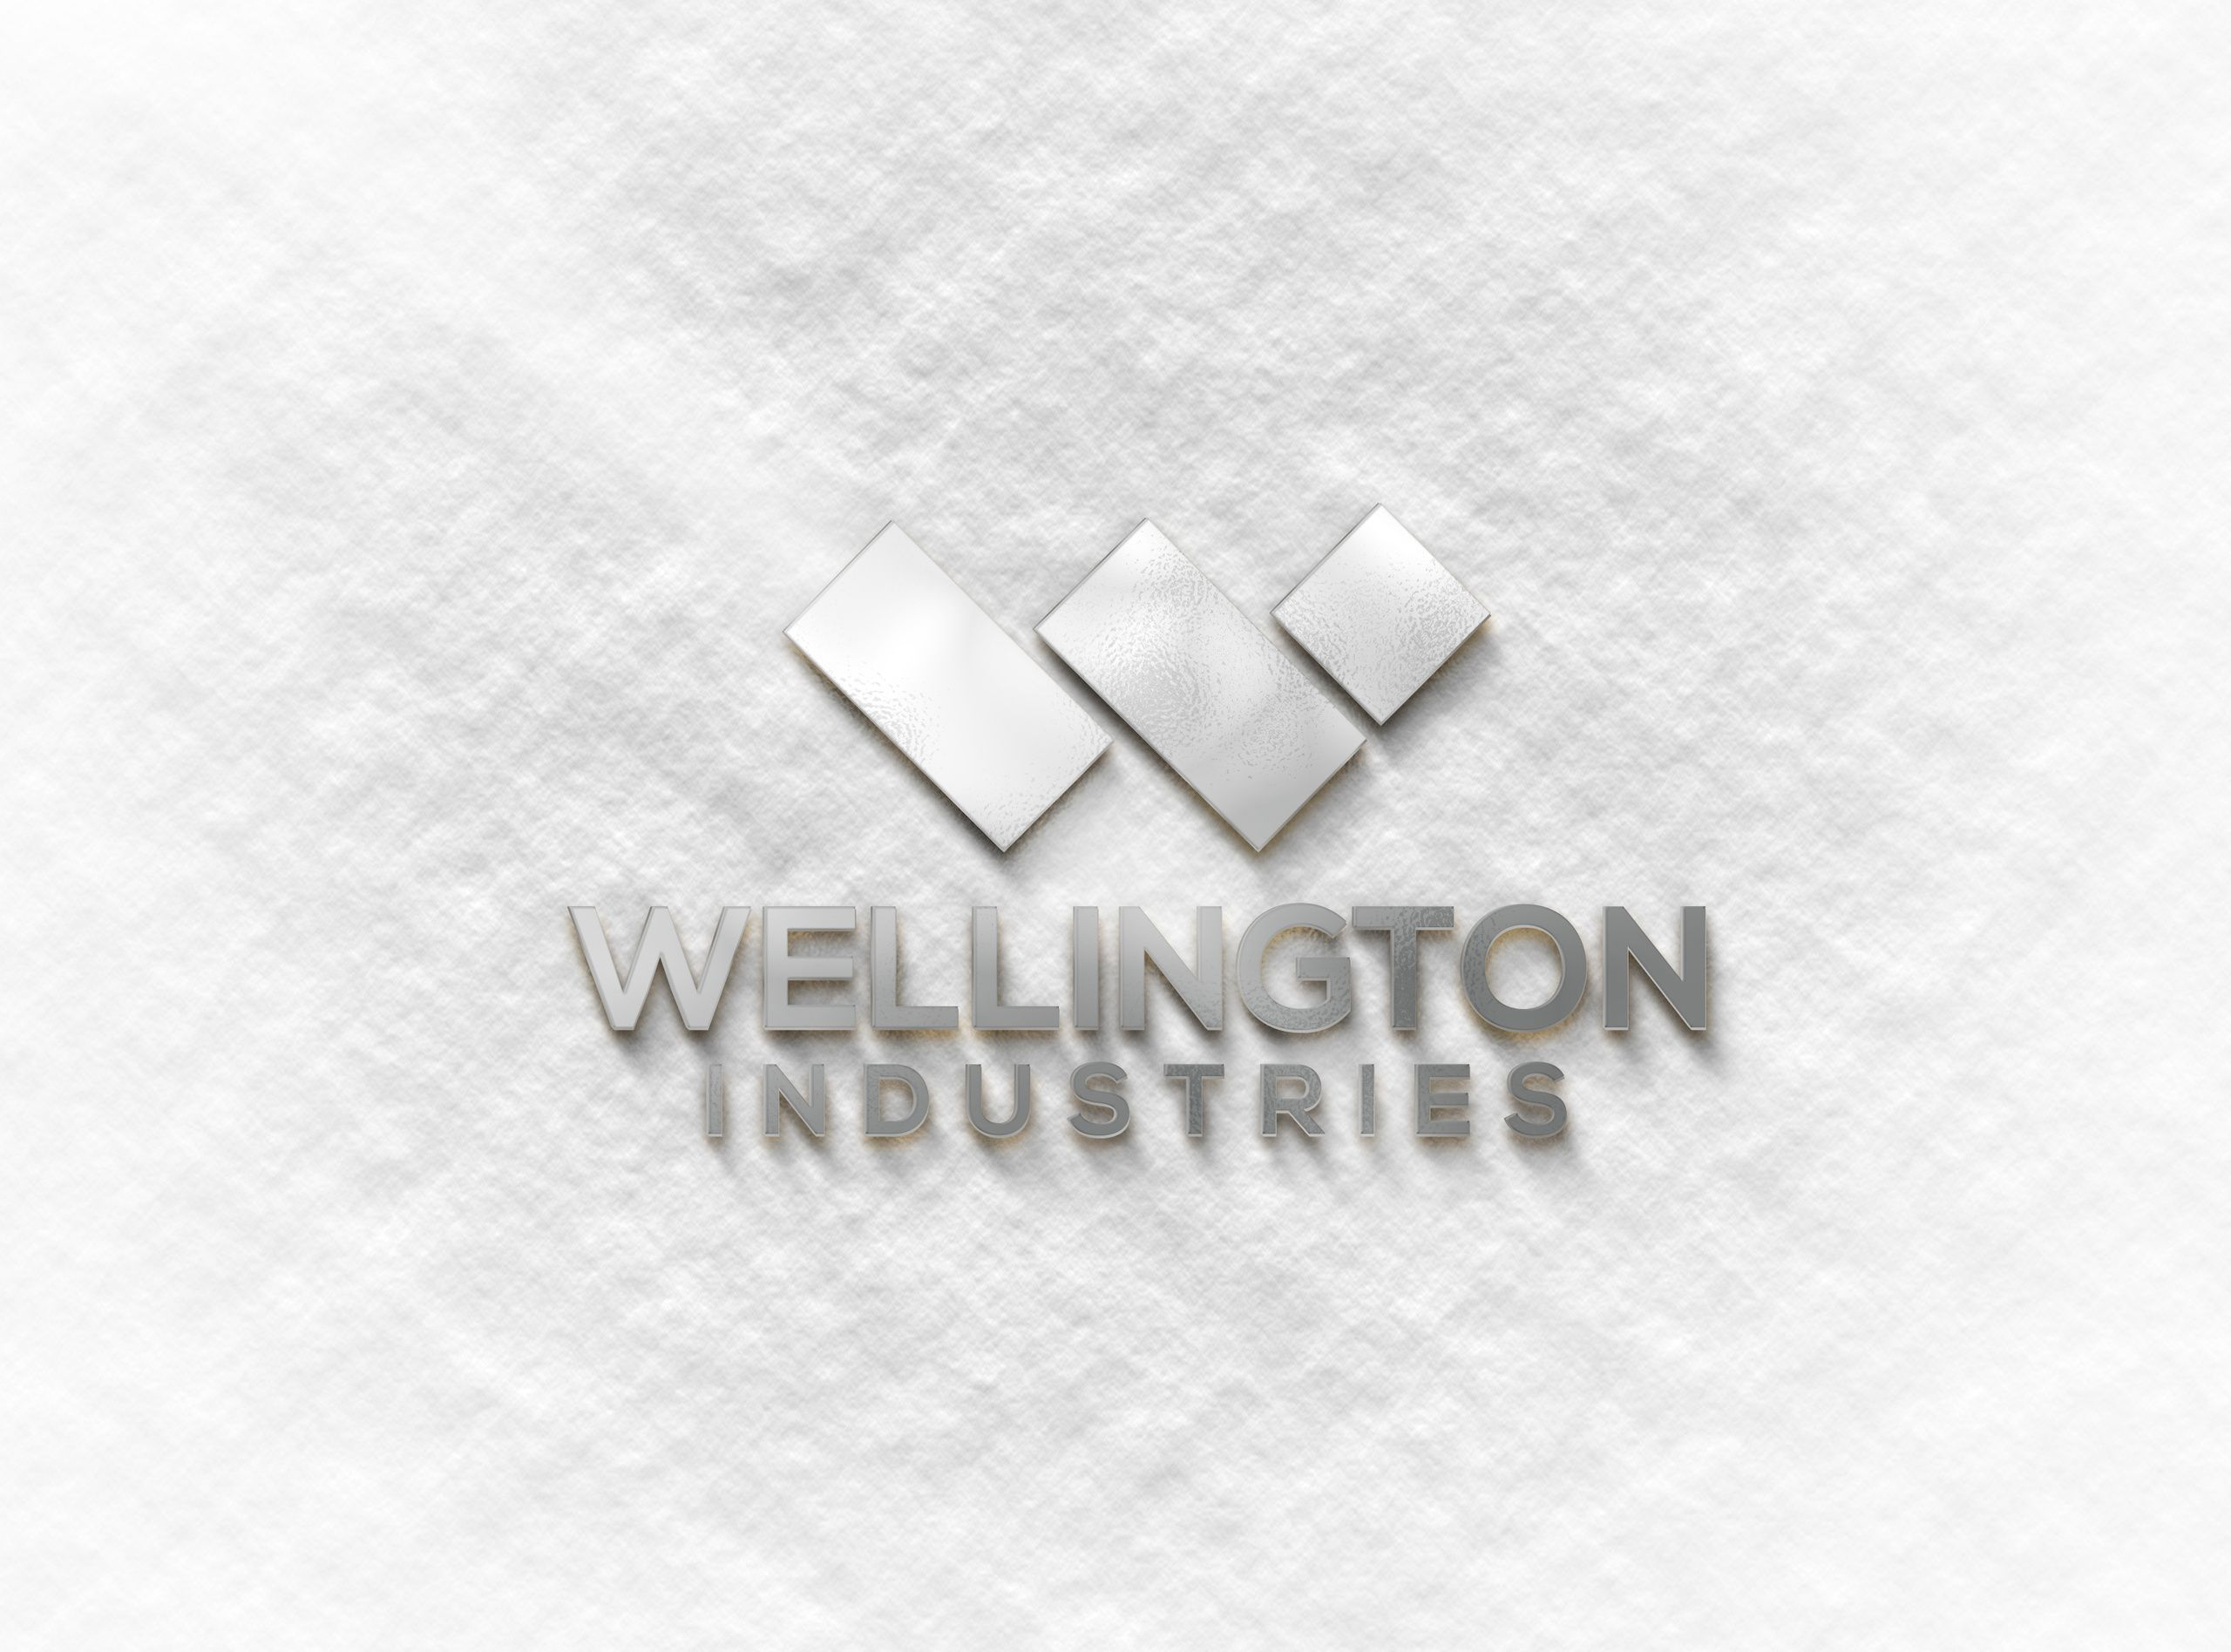 Wellington Industries